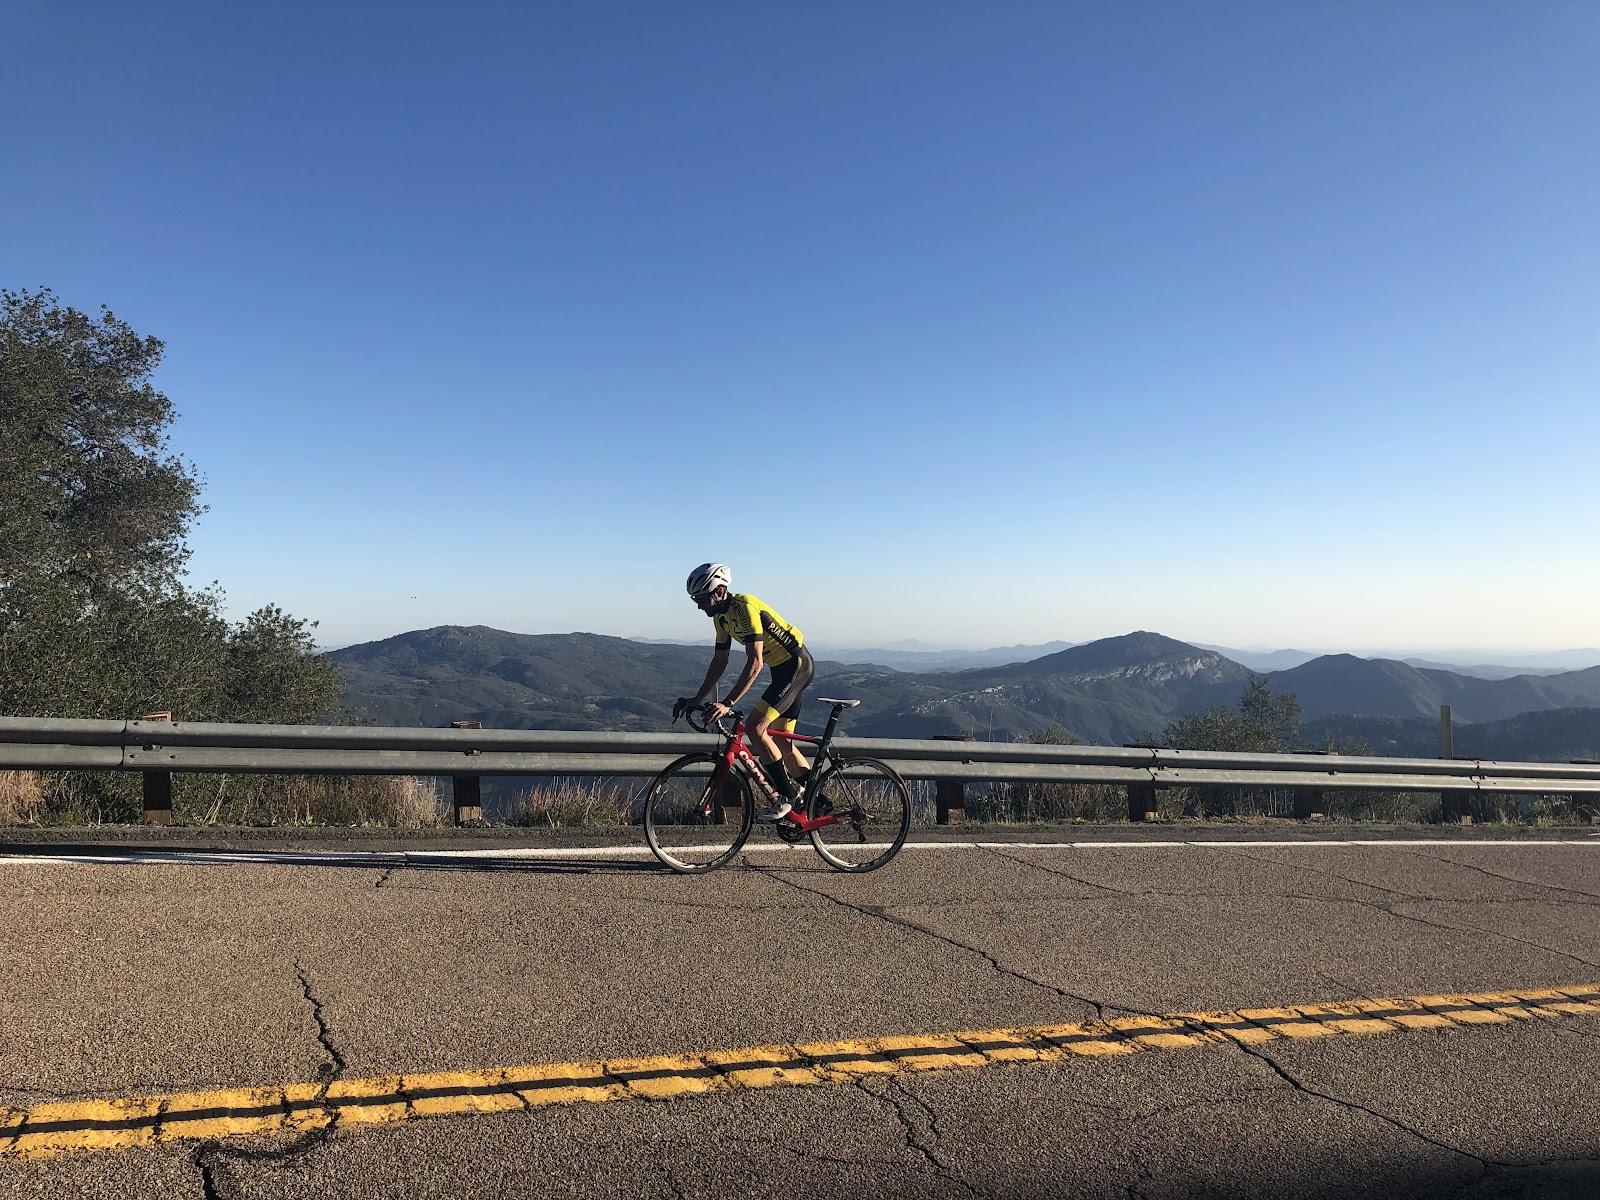 Cycling Palomar Mountain - cyclist on bike south grade road